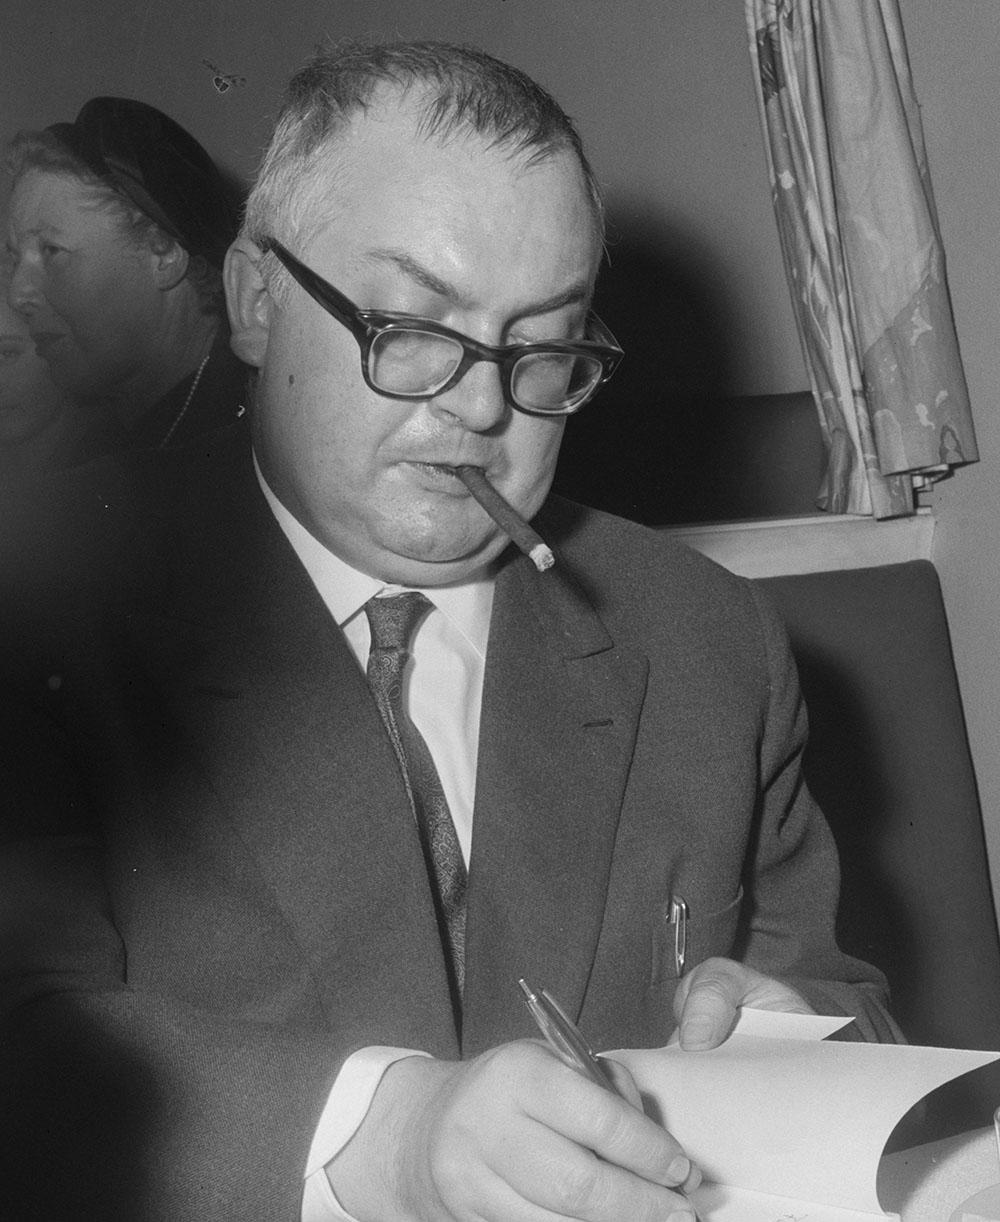 Friedrich Dürrenmatt en train de dédicacer un livre, 1958.